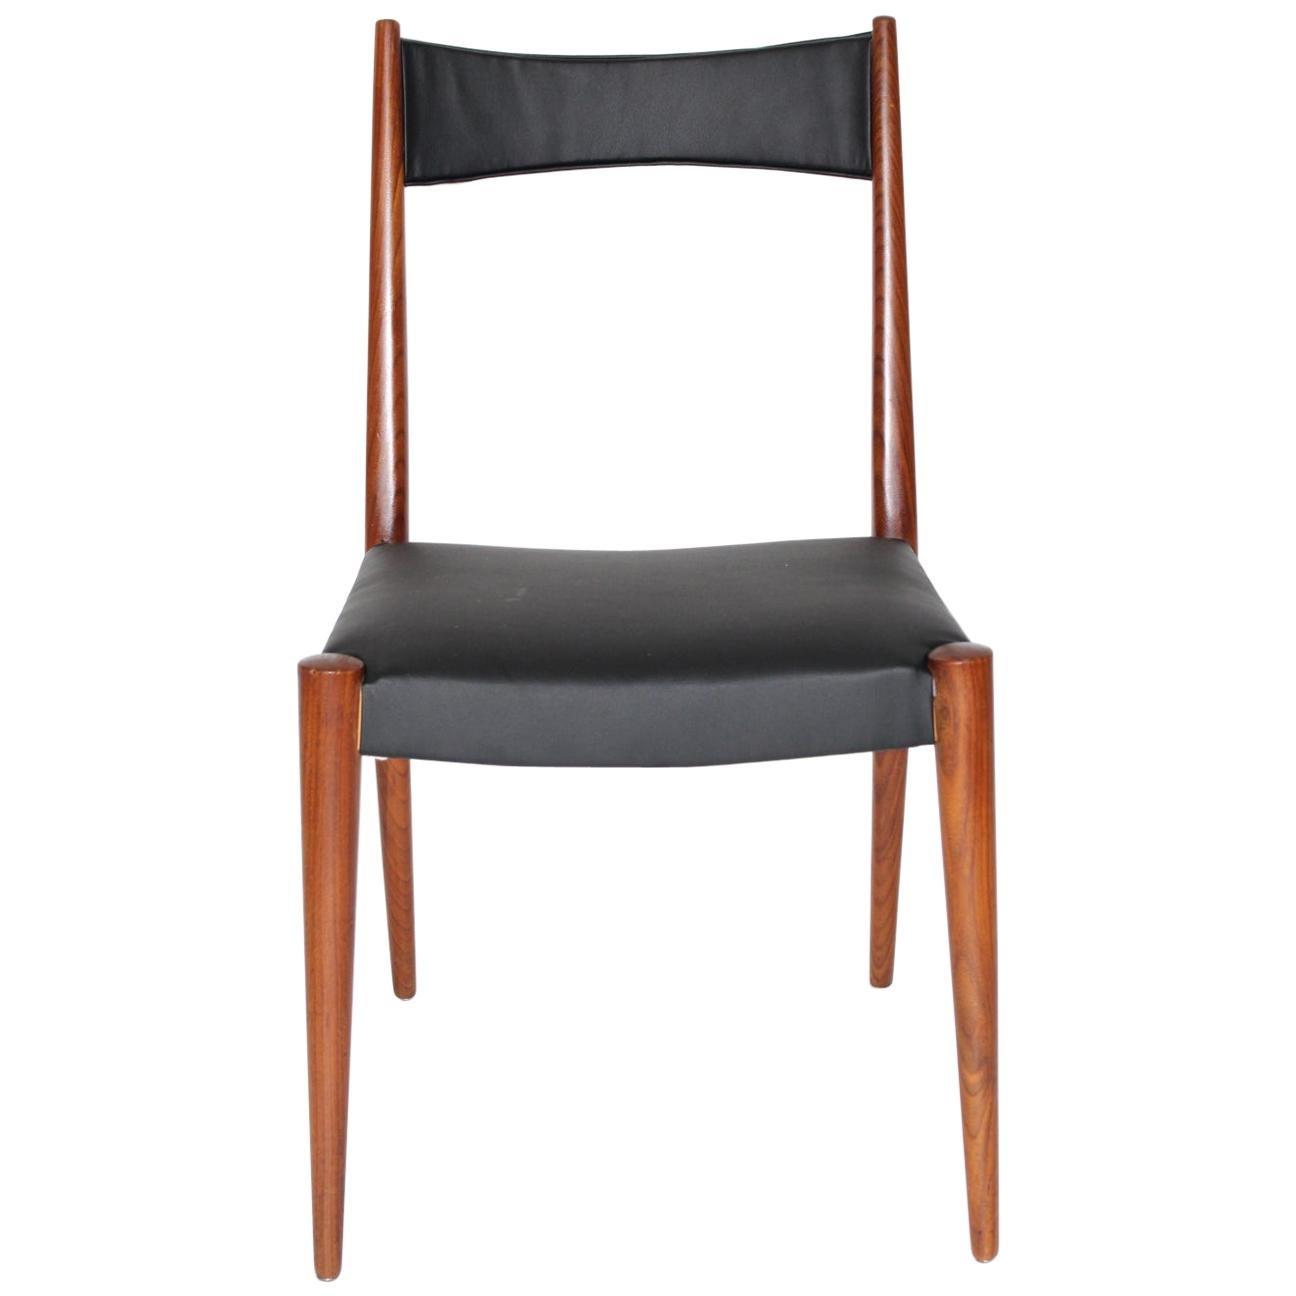 Mid-Century Modern Vintage Beech Chair by Anna-Lülja Praun 1953 Austria